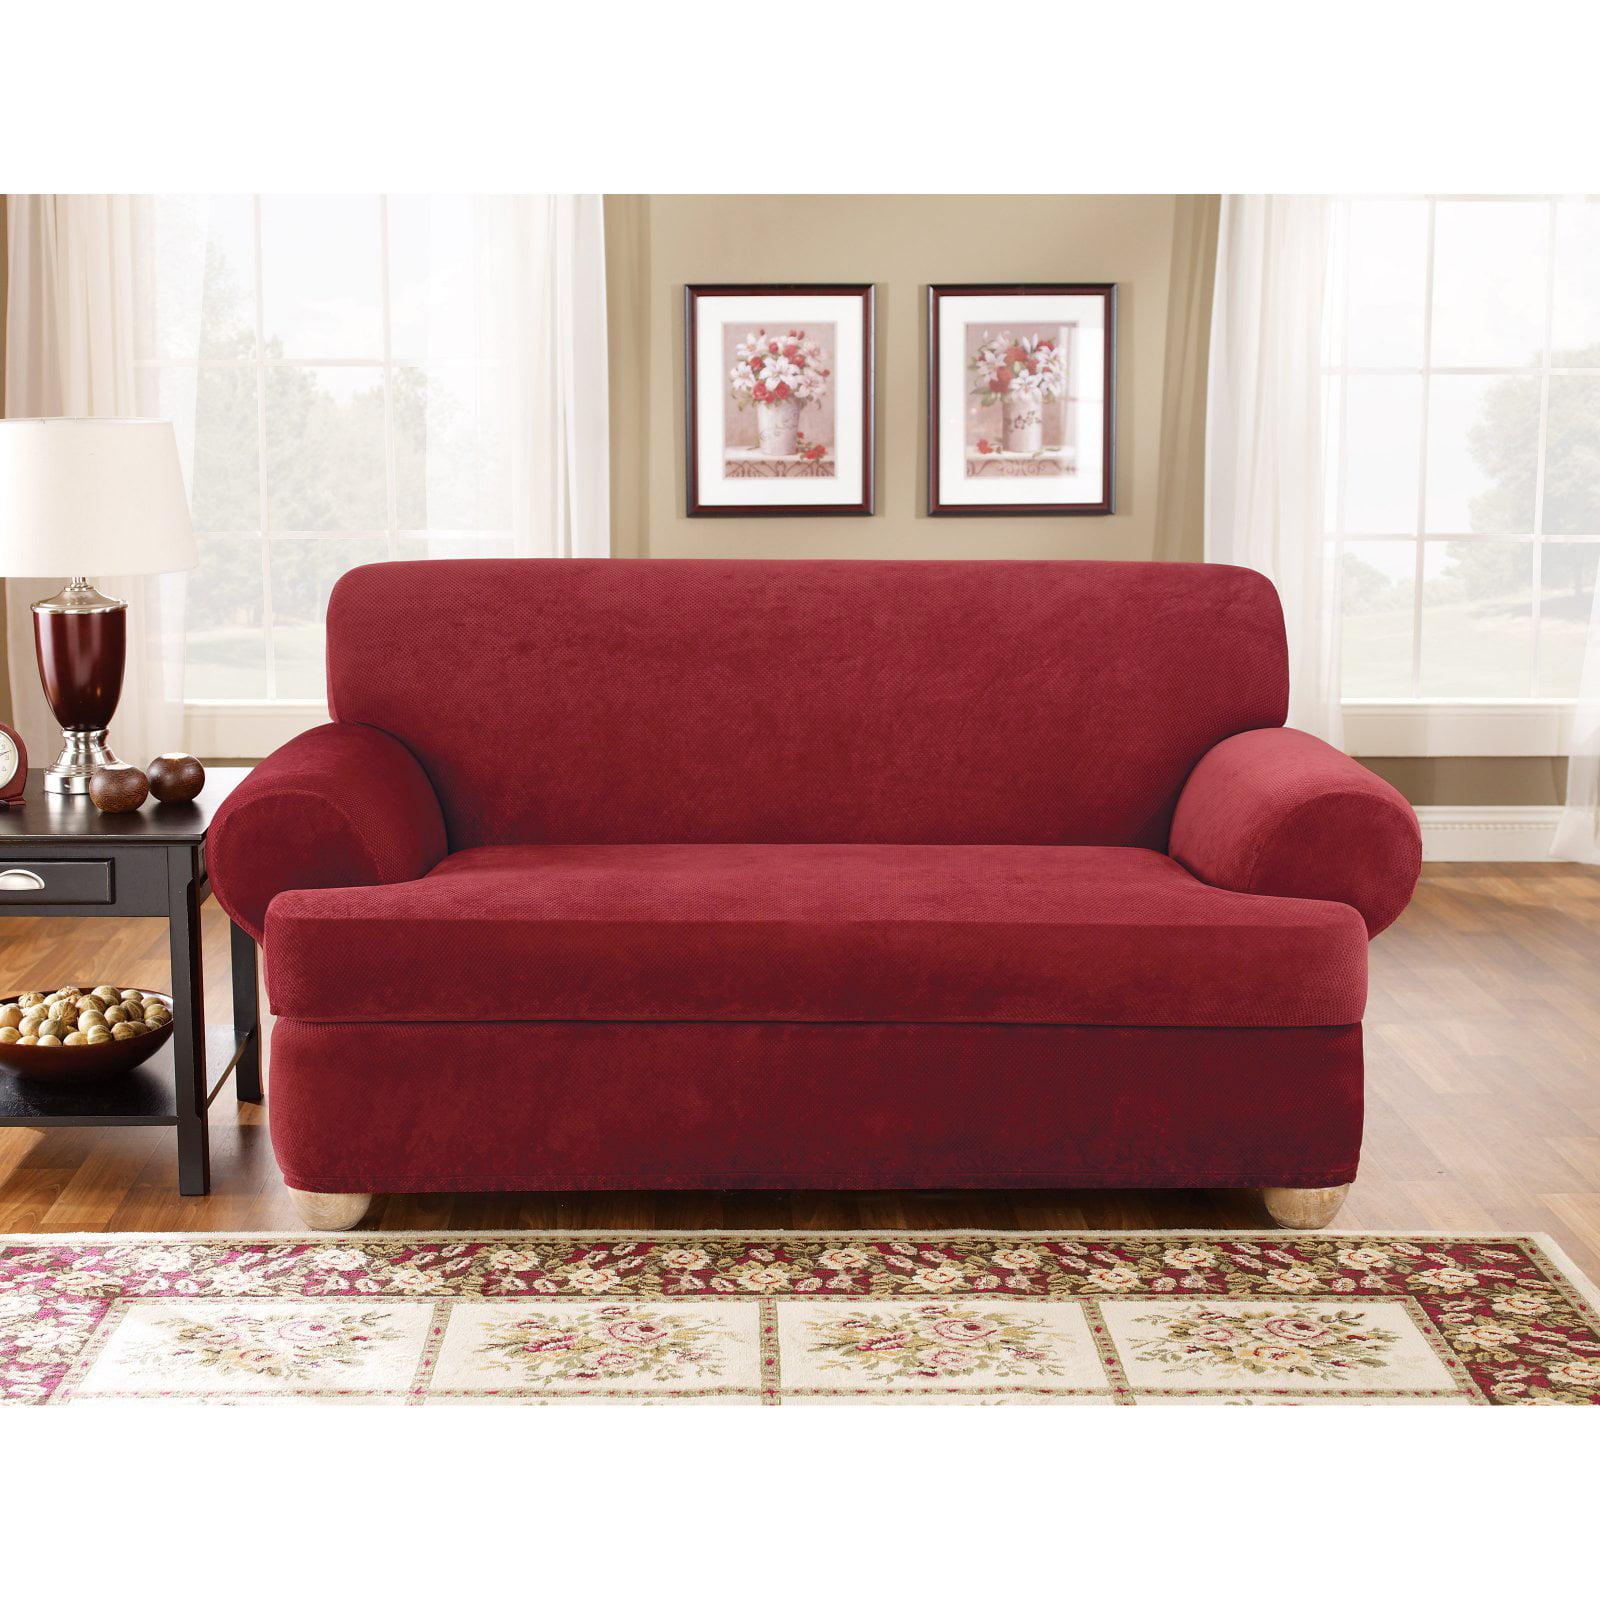 Sure Fit Stretch Pique T-Cushion Three Piece Sofa Slipcover